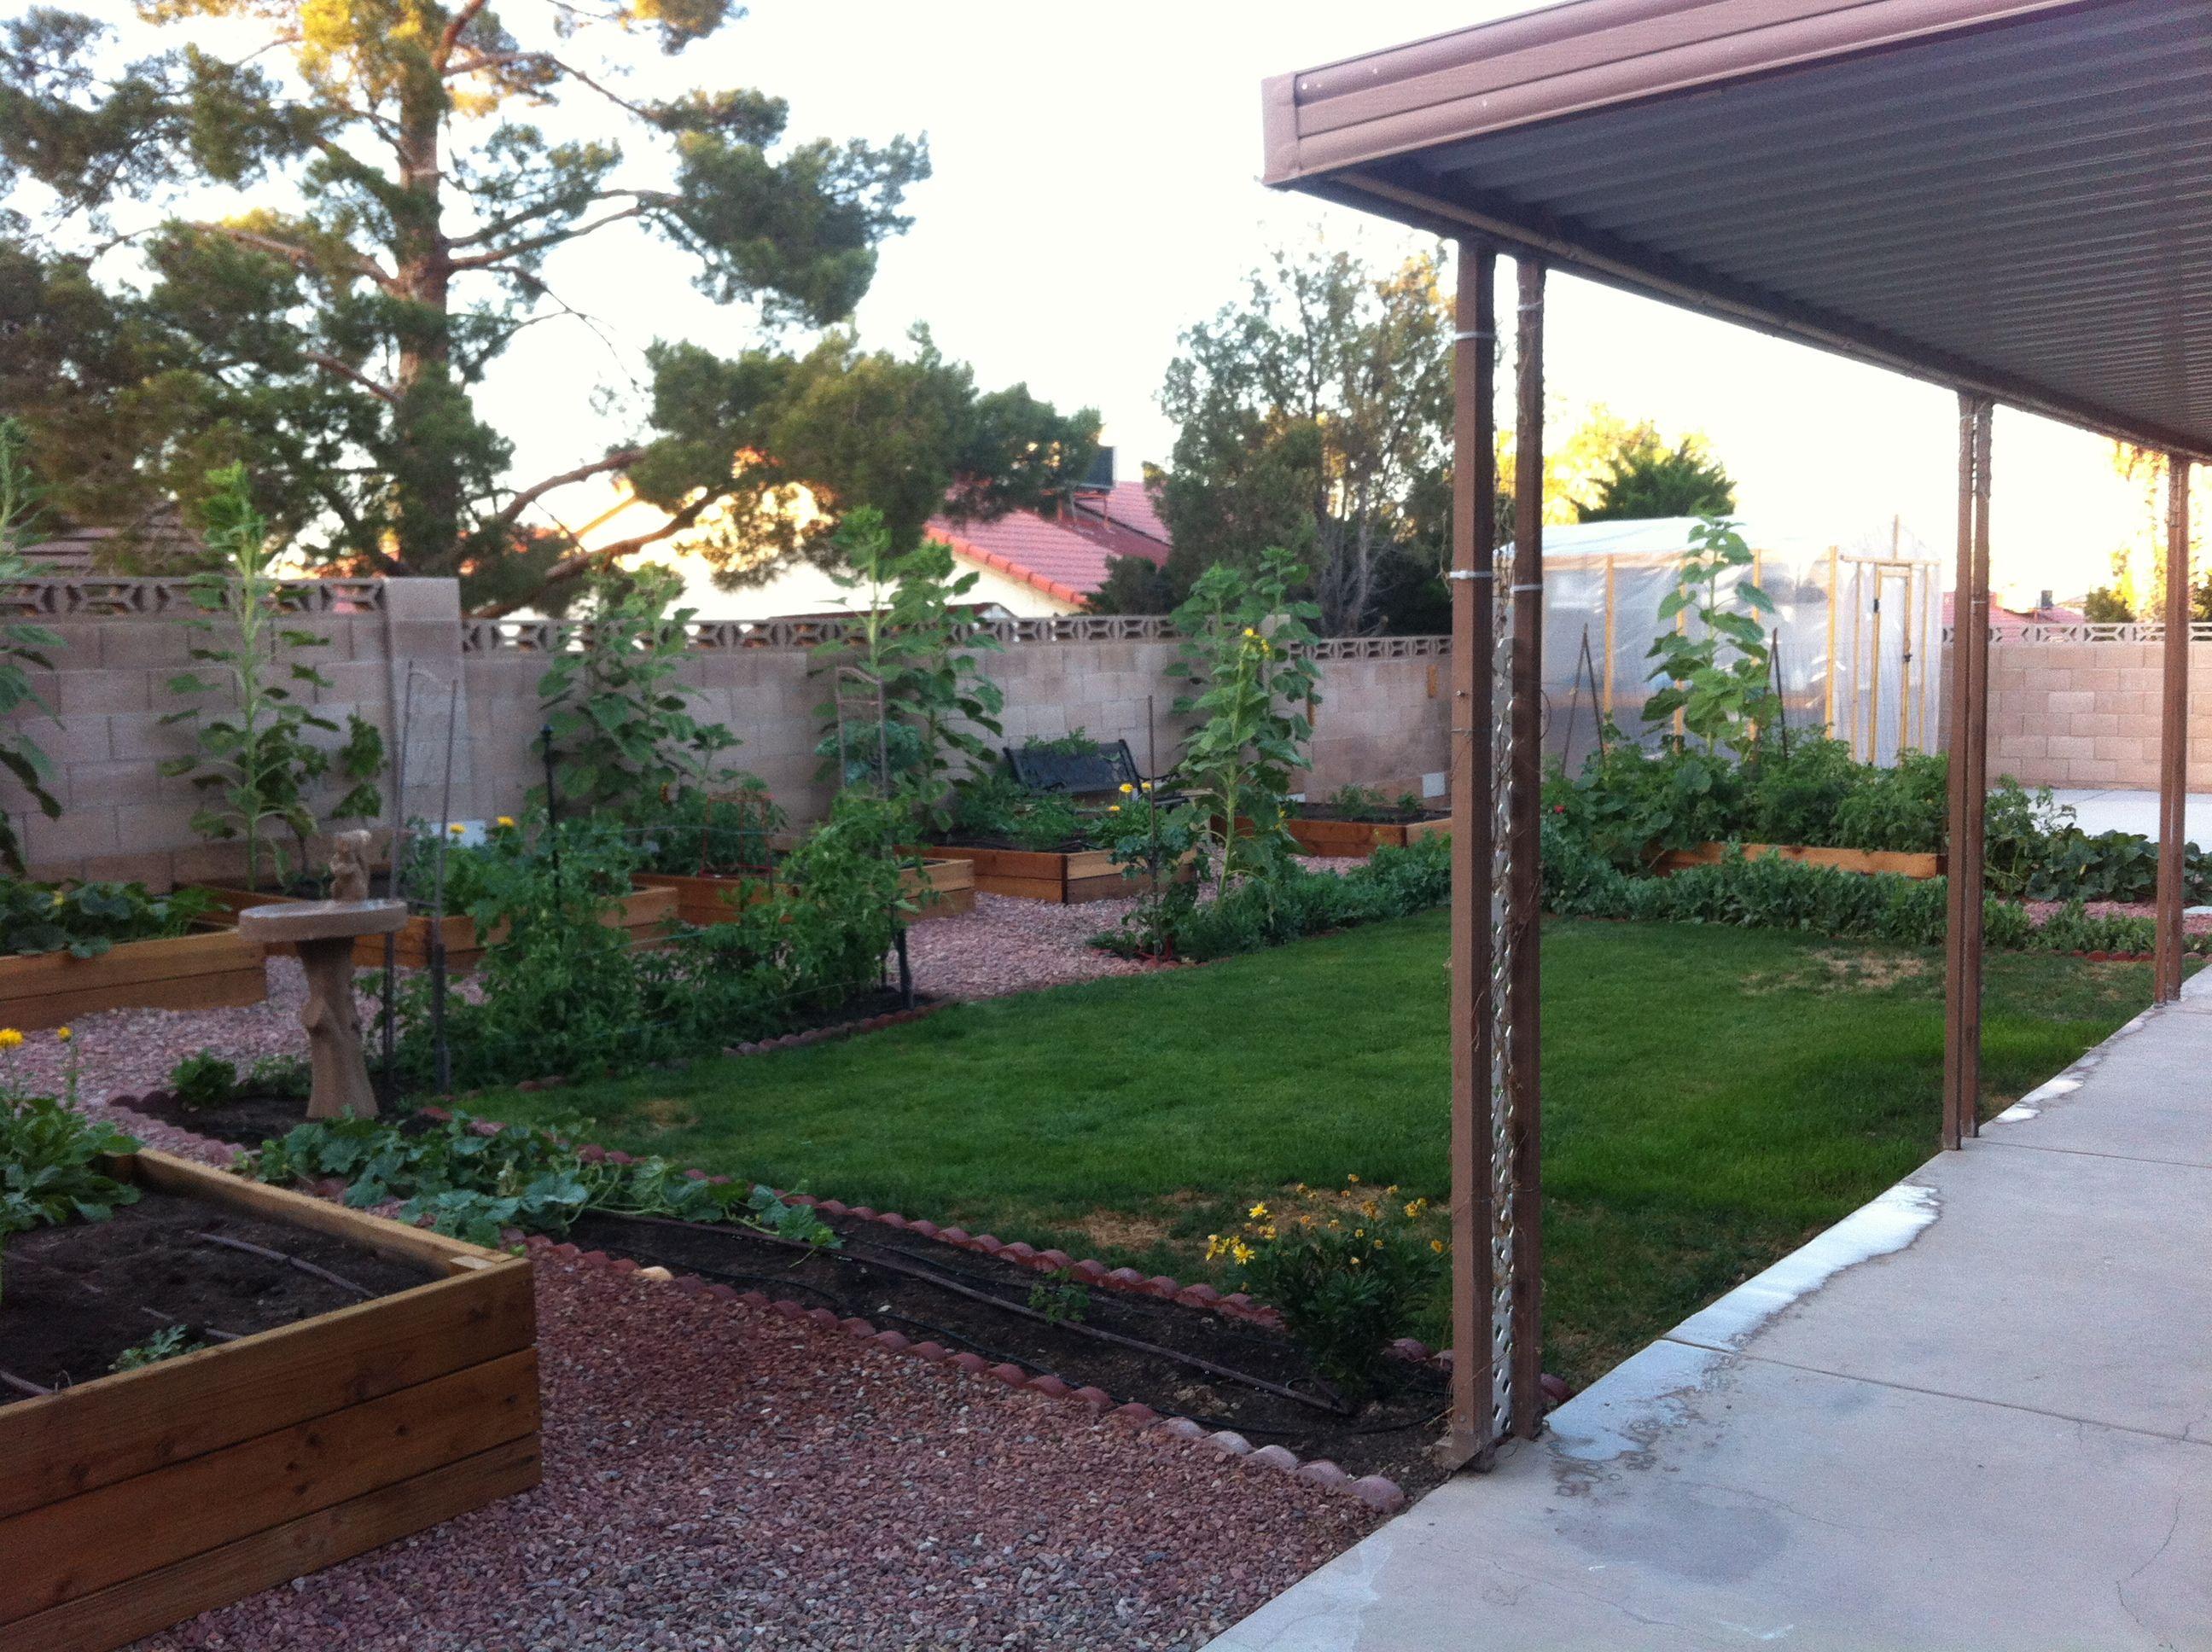 My Las Vegas Organic Garden. Hereu0027s Another View For Yau0027ll.